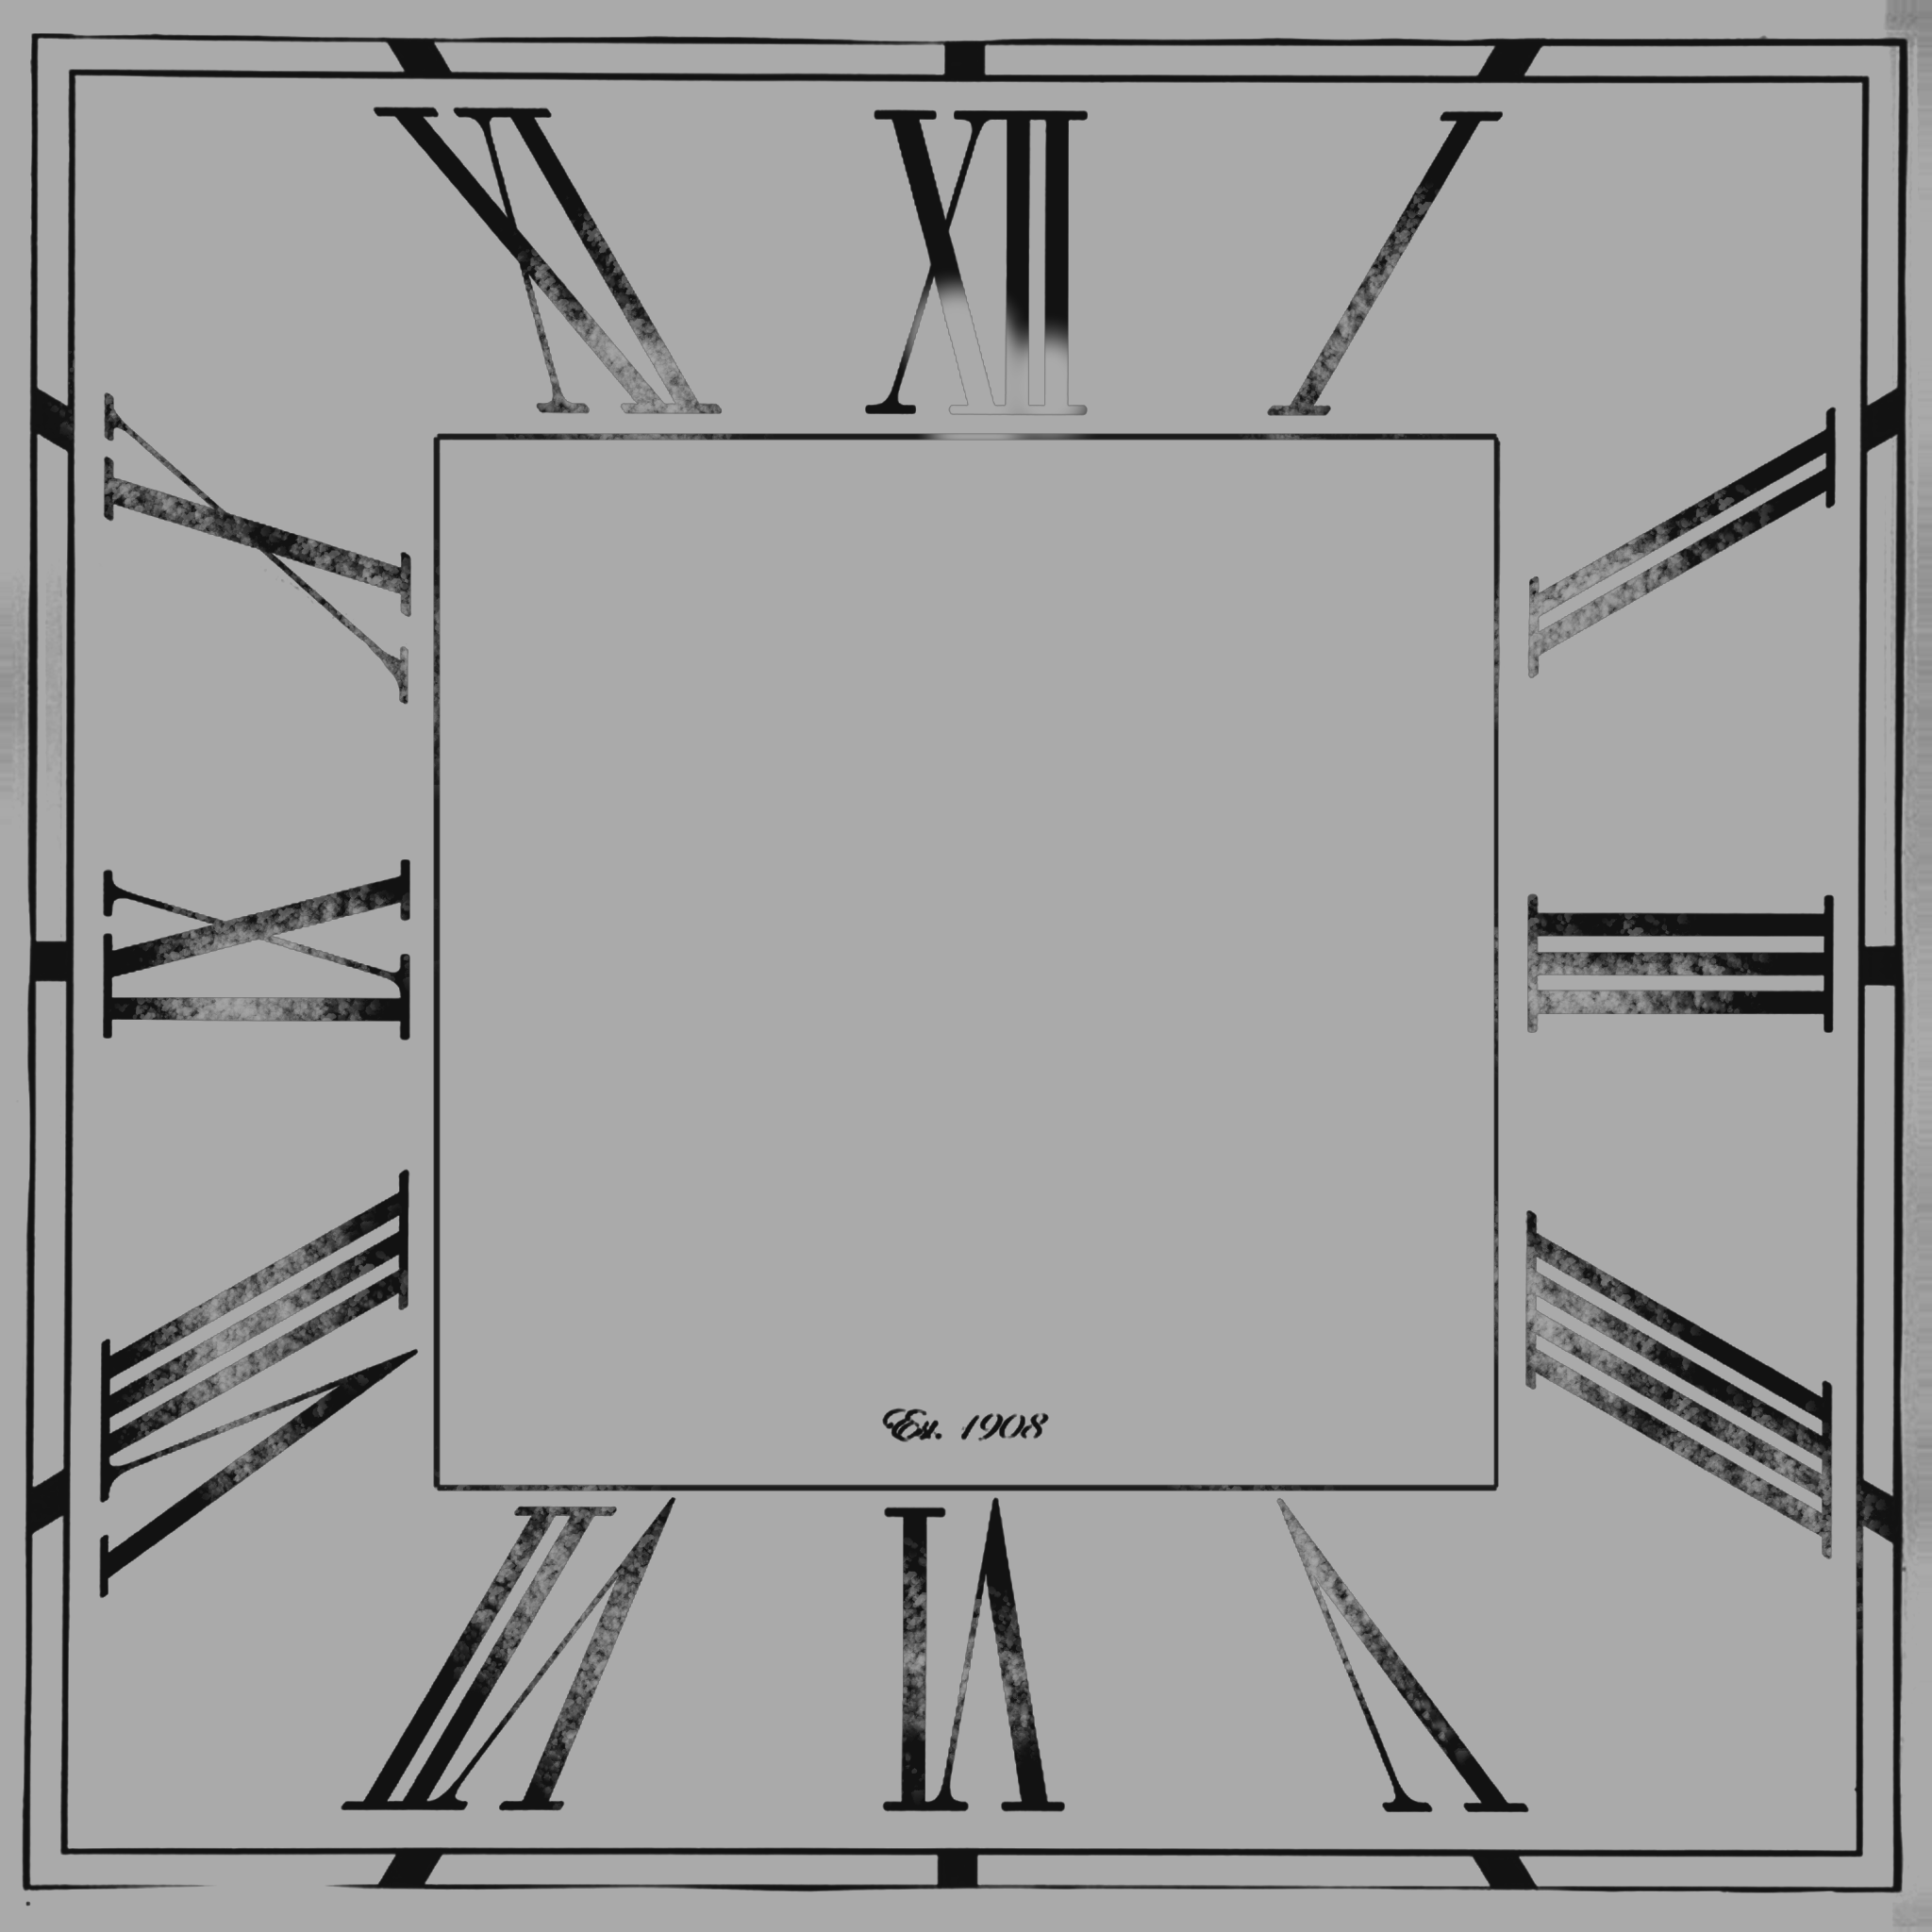 clock_uvSet1_phong1SG_ior.png